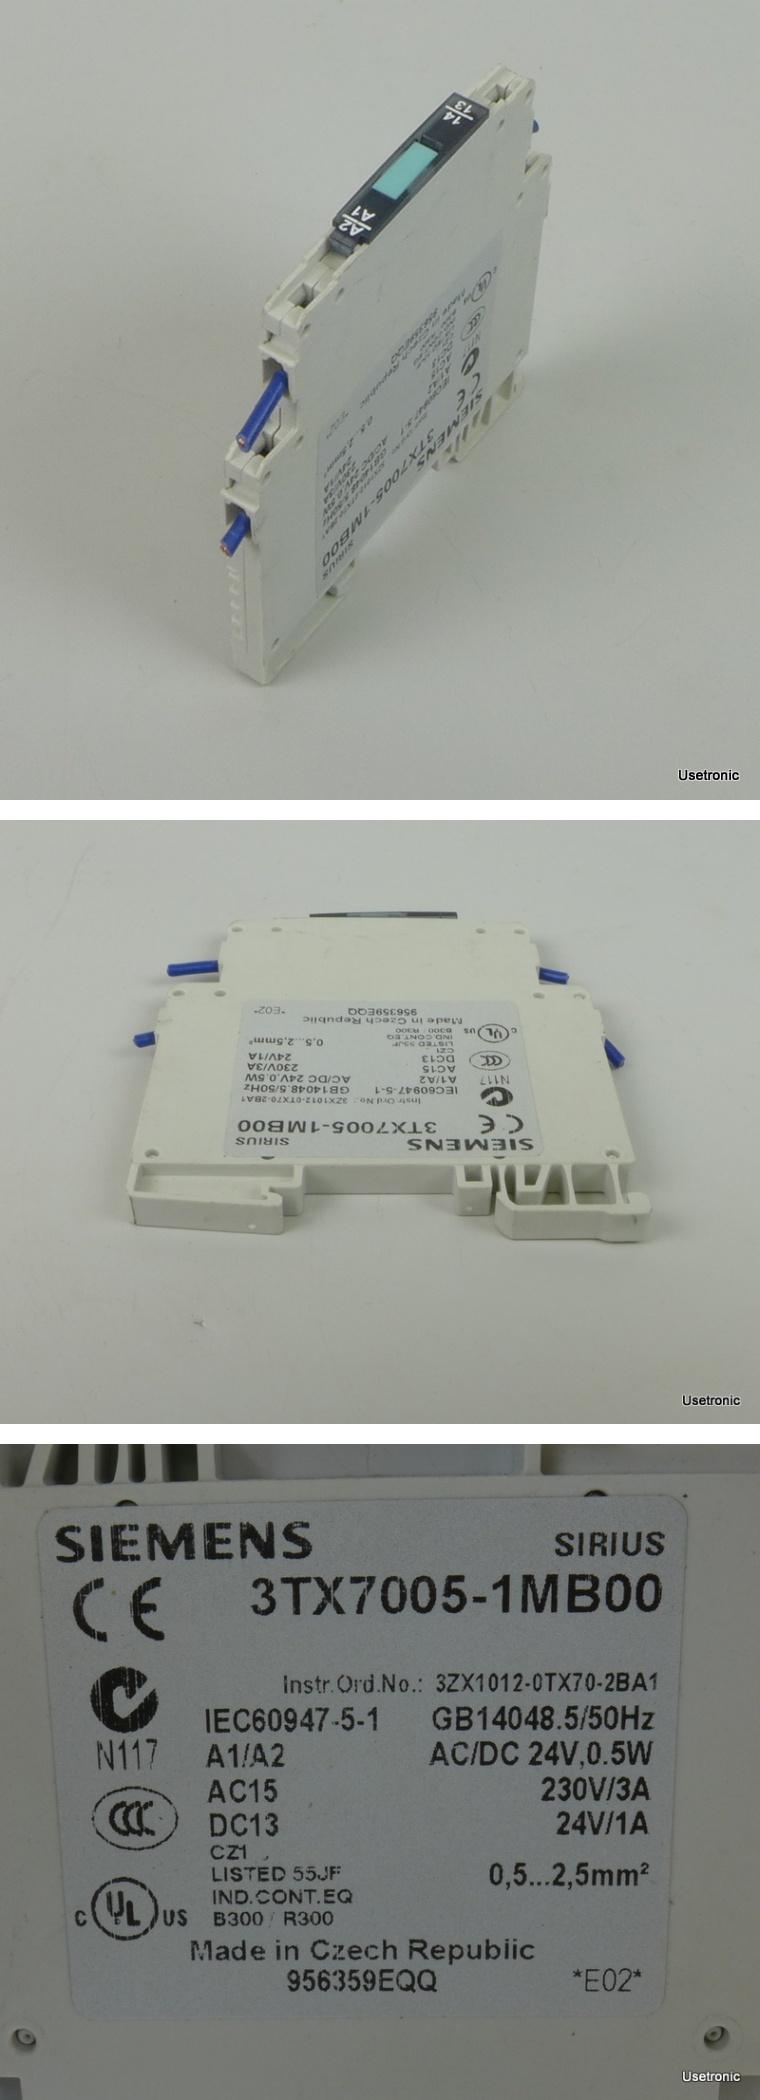 Siemens 3TX7005-1MB00